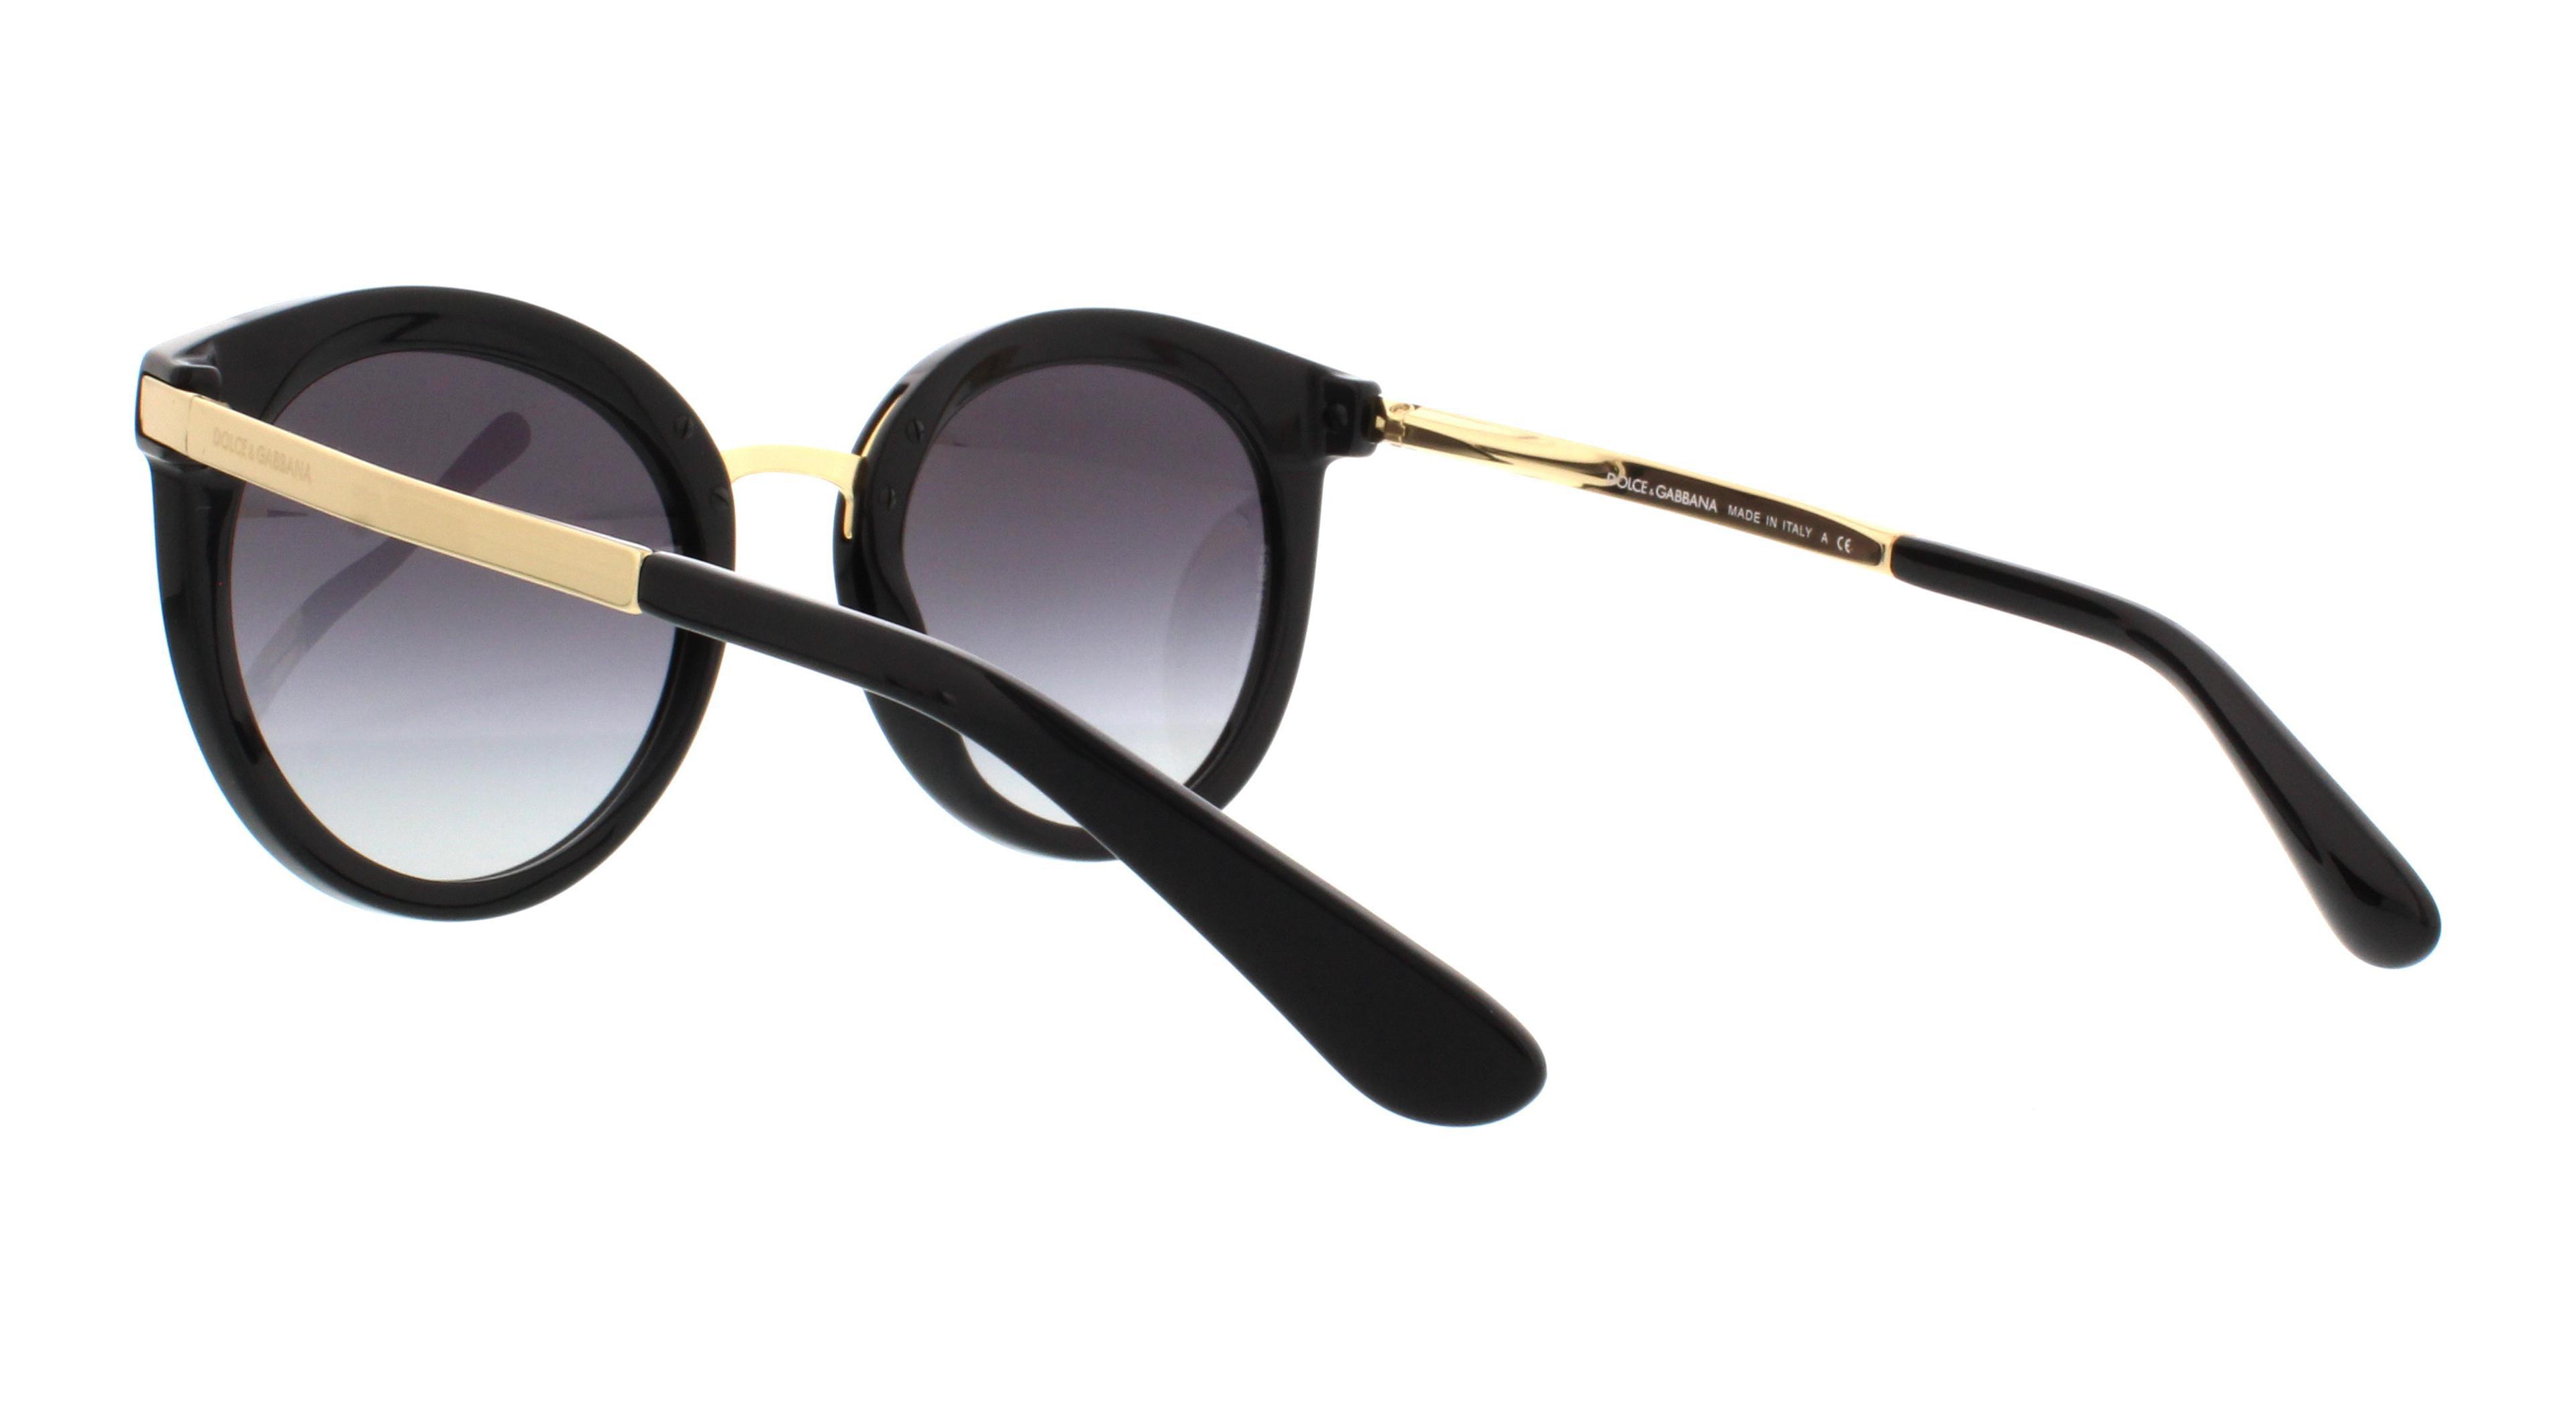 Dolce   Gabbana Women s Gradient DG4268-501 8G-52 Black Round Sunglasses -  Walmart.com 9f6dfbe25828